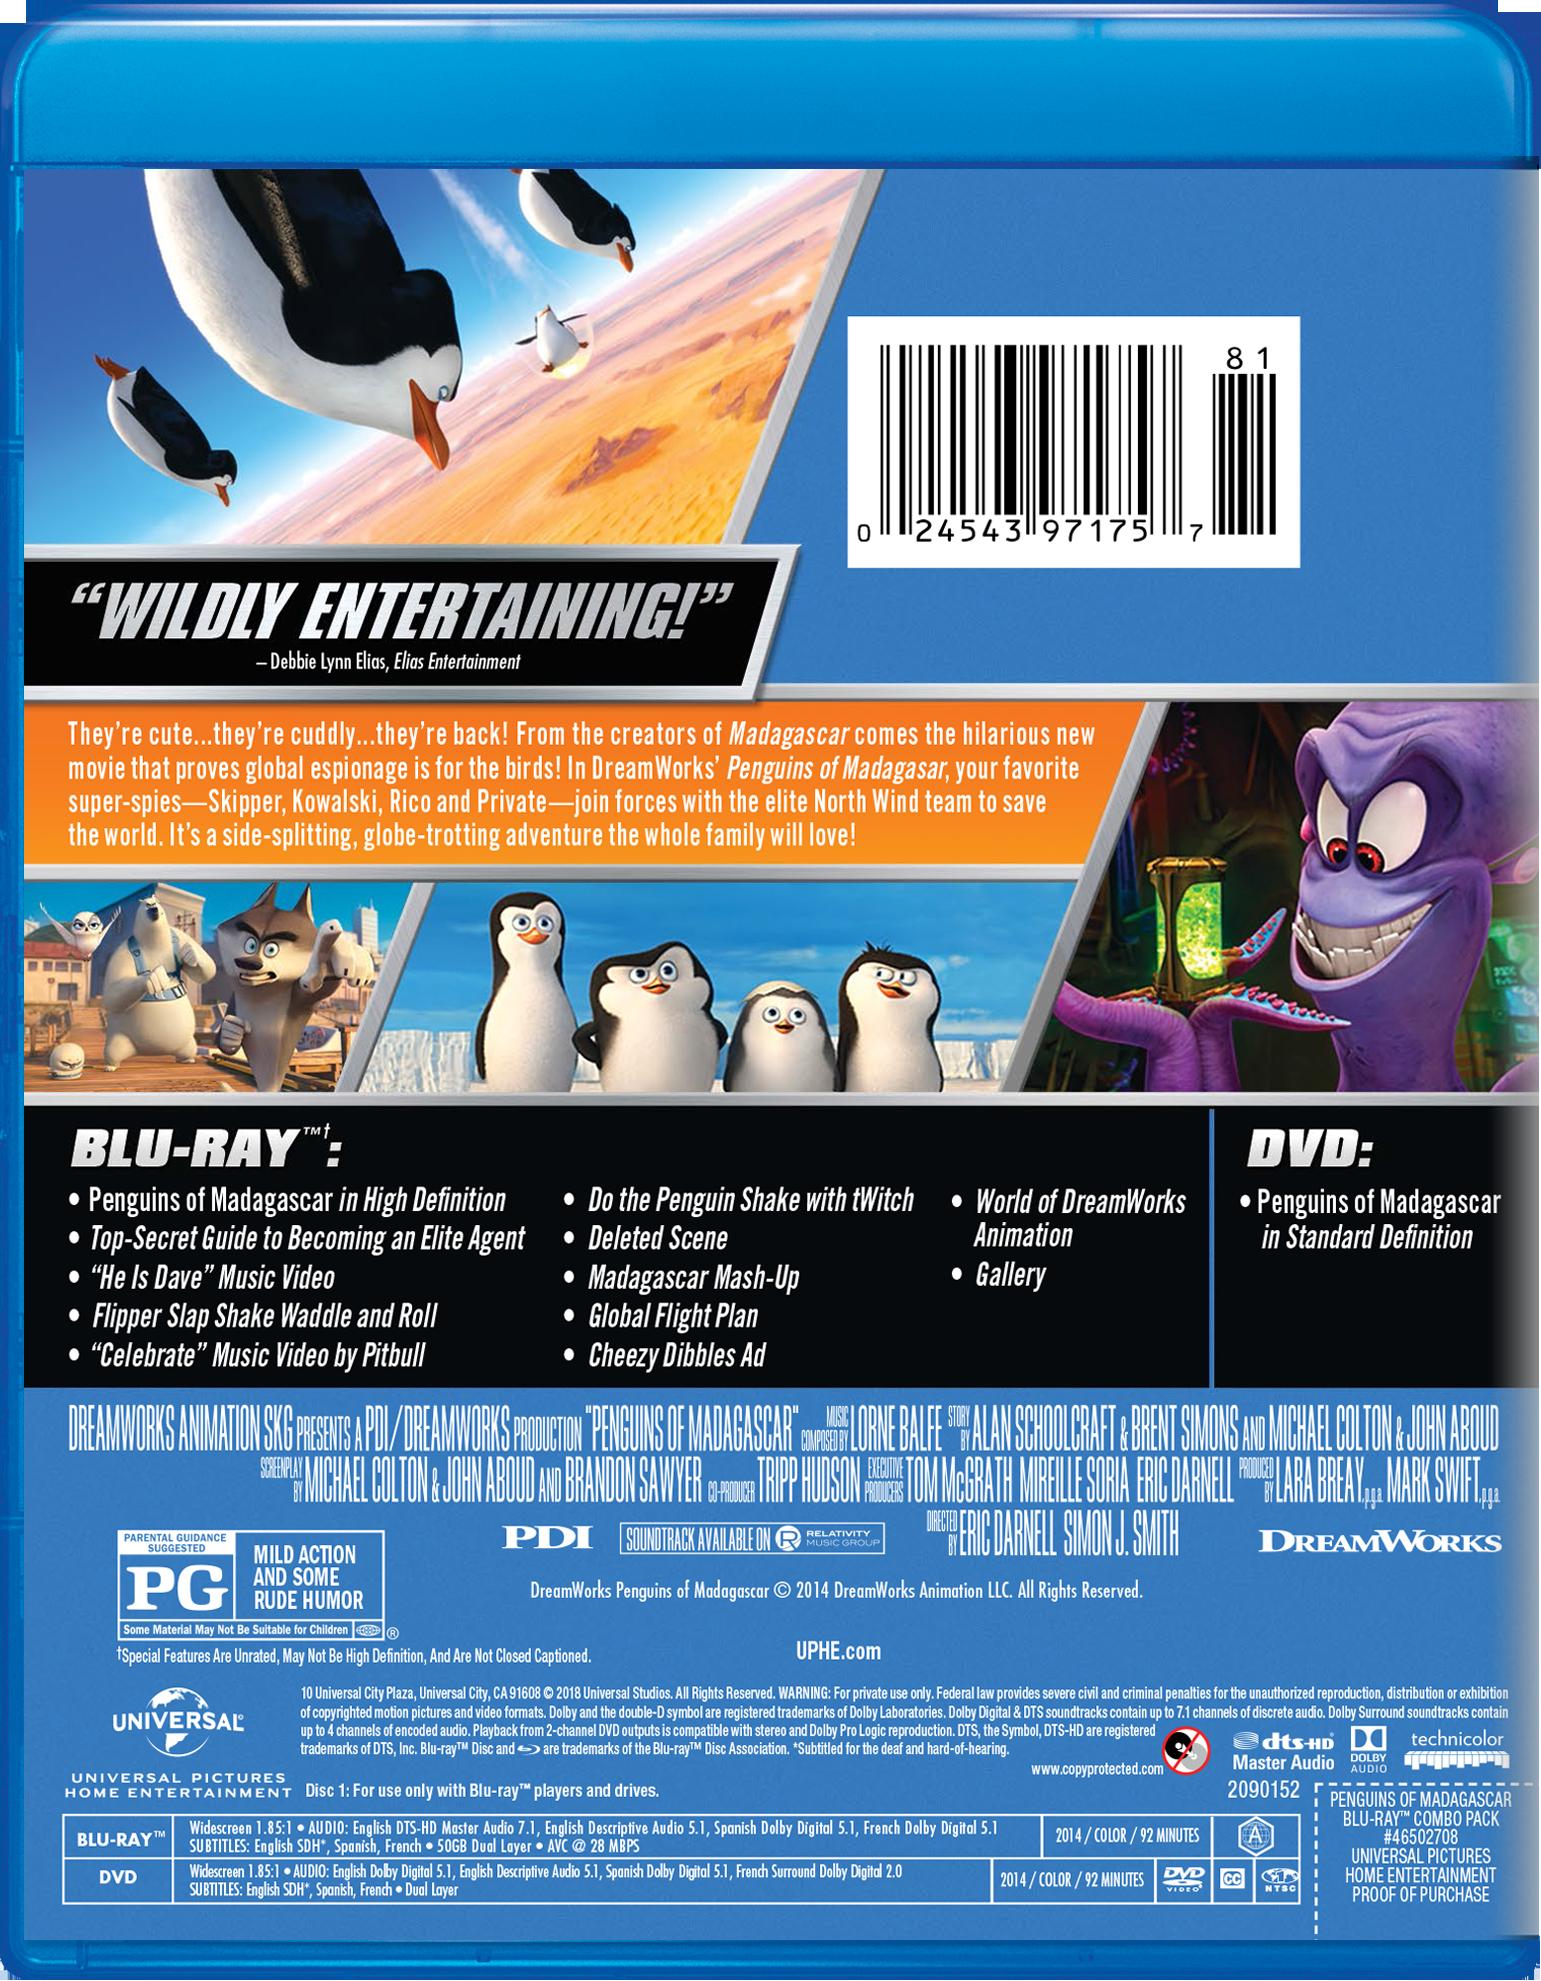 Penguins of Madagascar (Blu-ray DVD)#Madagascar, #Penguins, #Blu